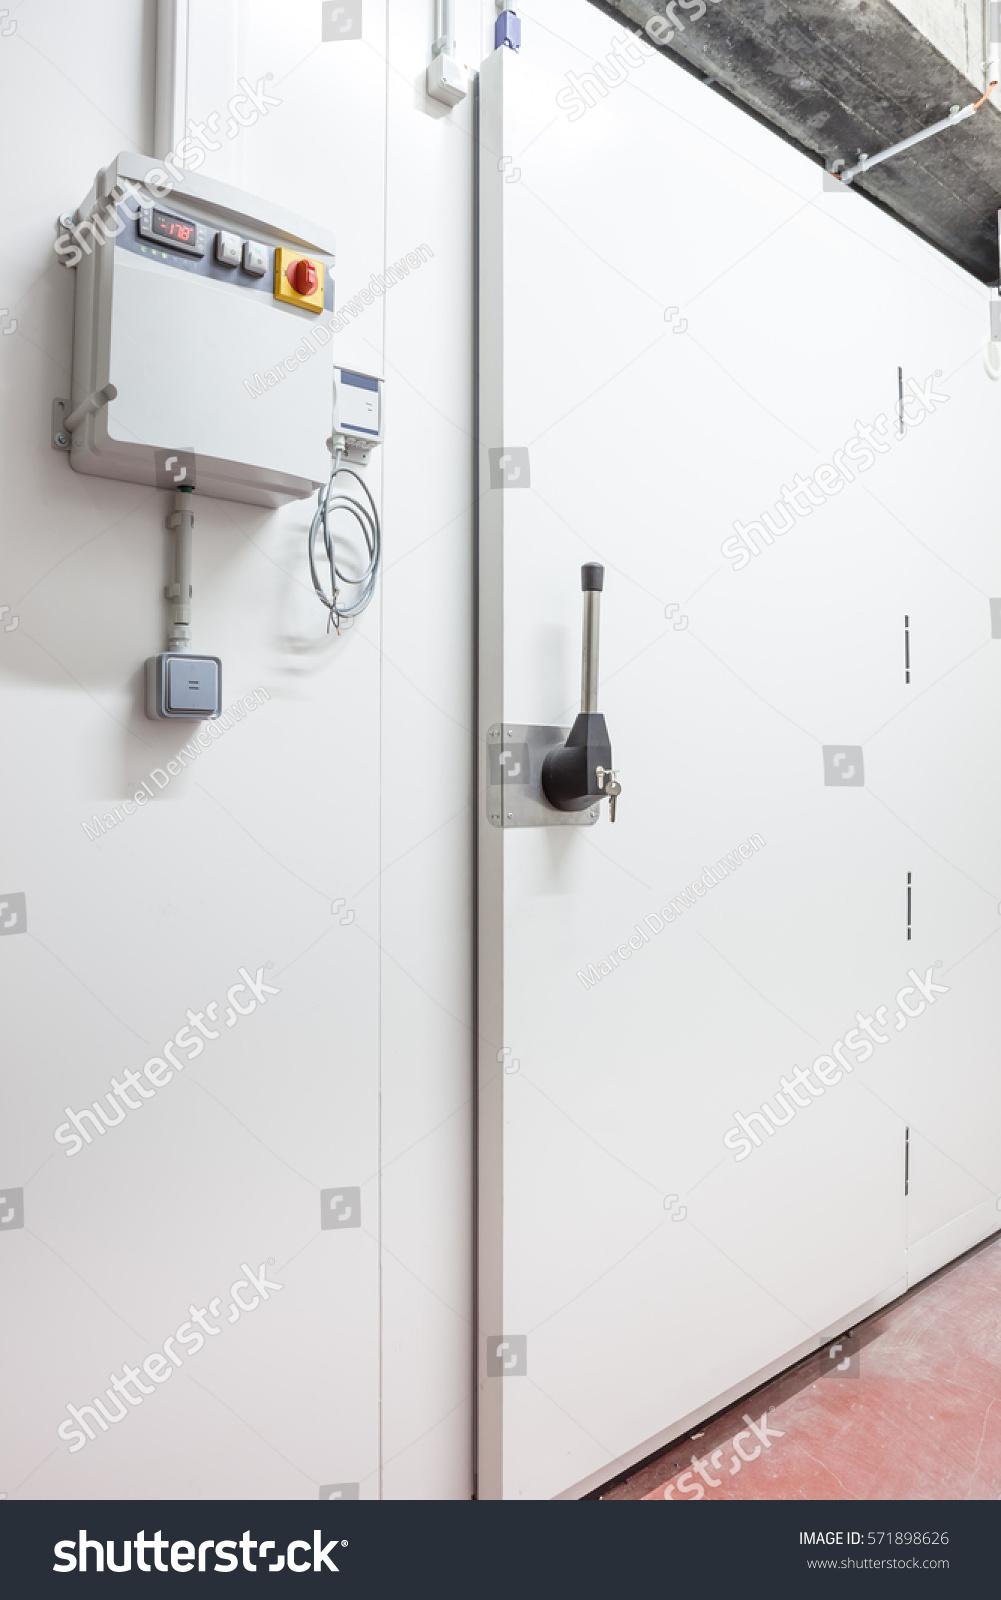 Images of Refrigerator Door Pull Handle - Losro.com